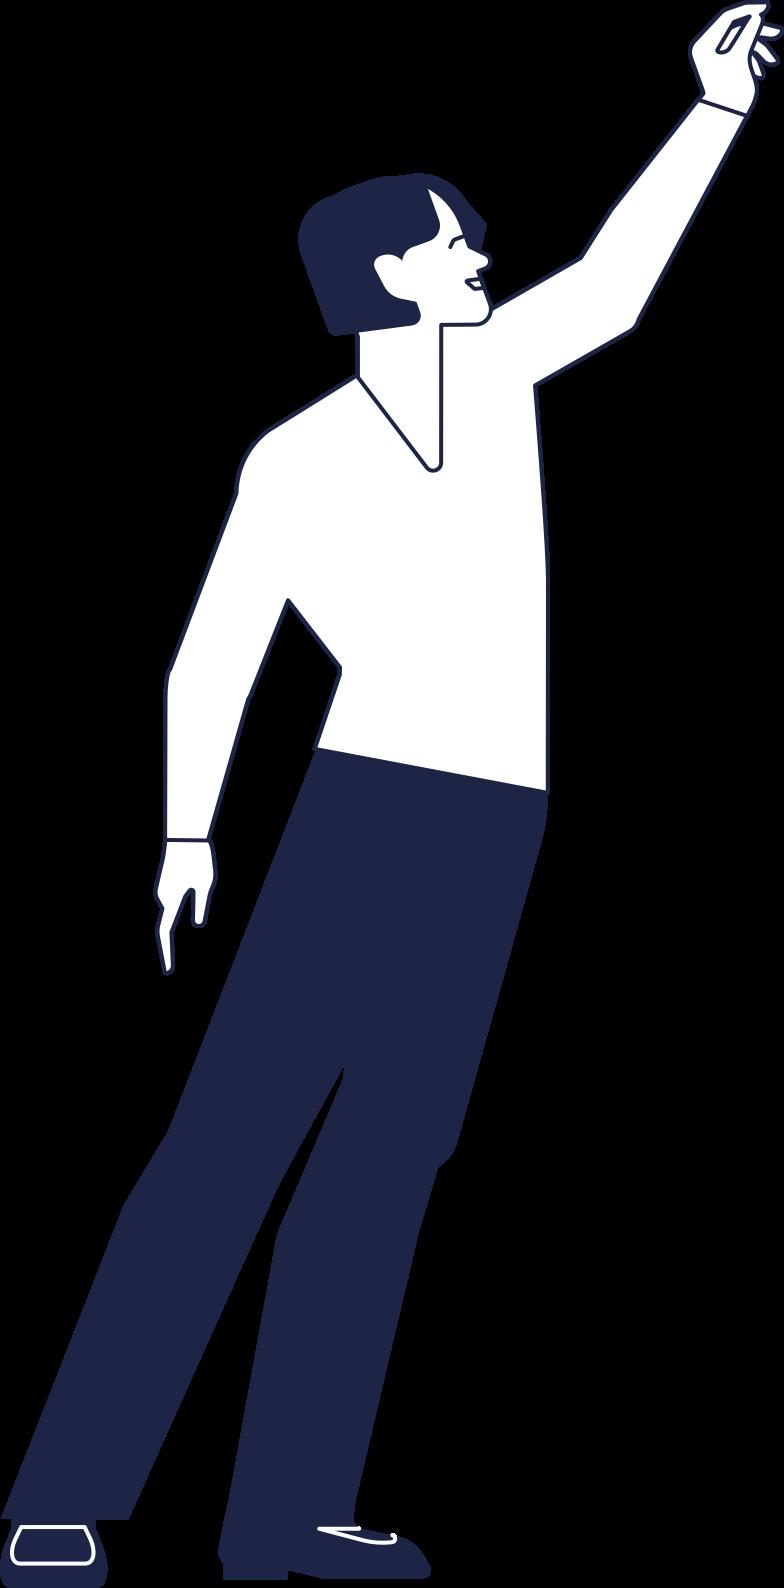 mann mit erhobener hand Clipart-Grafik als PNG, SVG